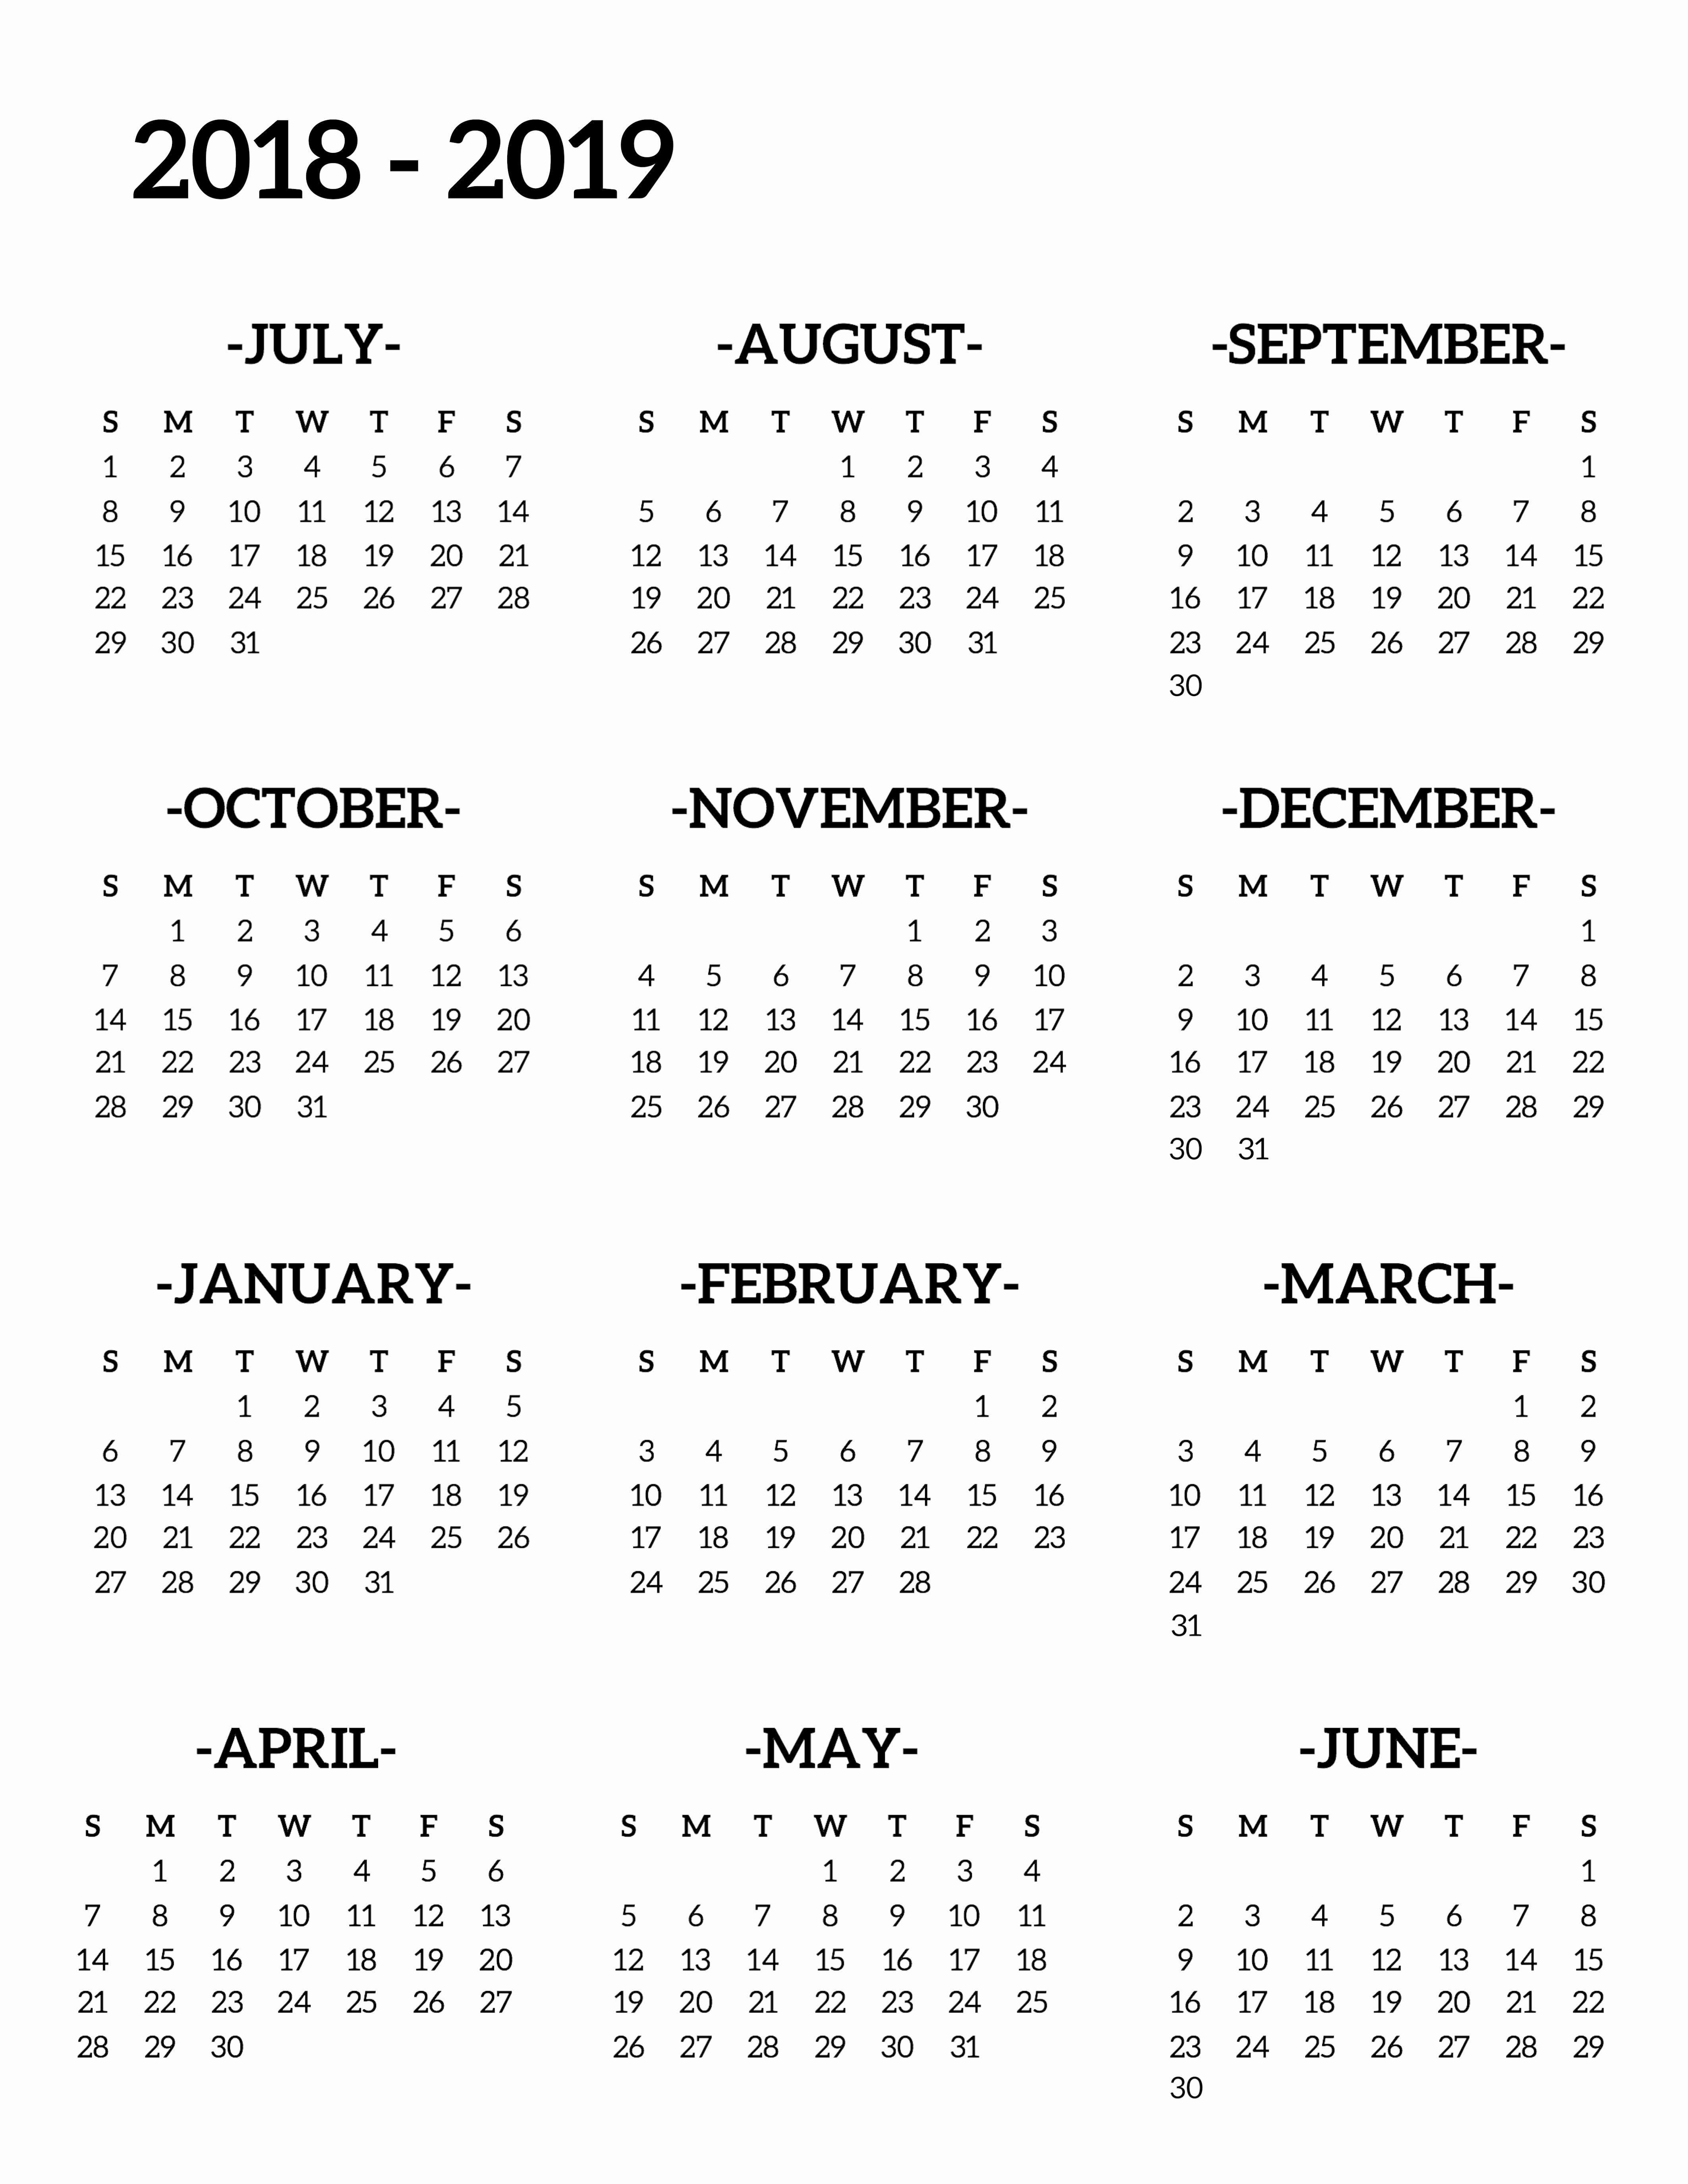 Printable 2018 and 2019 Calendar Fresh 2018 2019 School Calendar Printable Free Template Paper